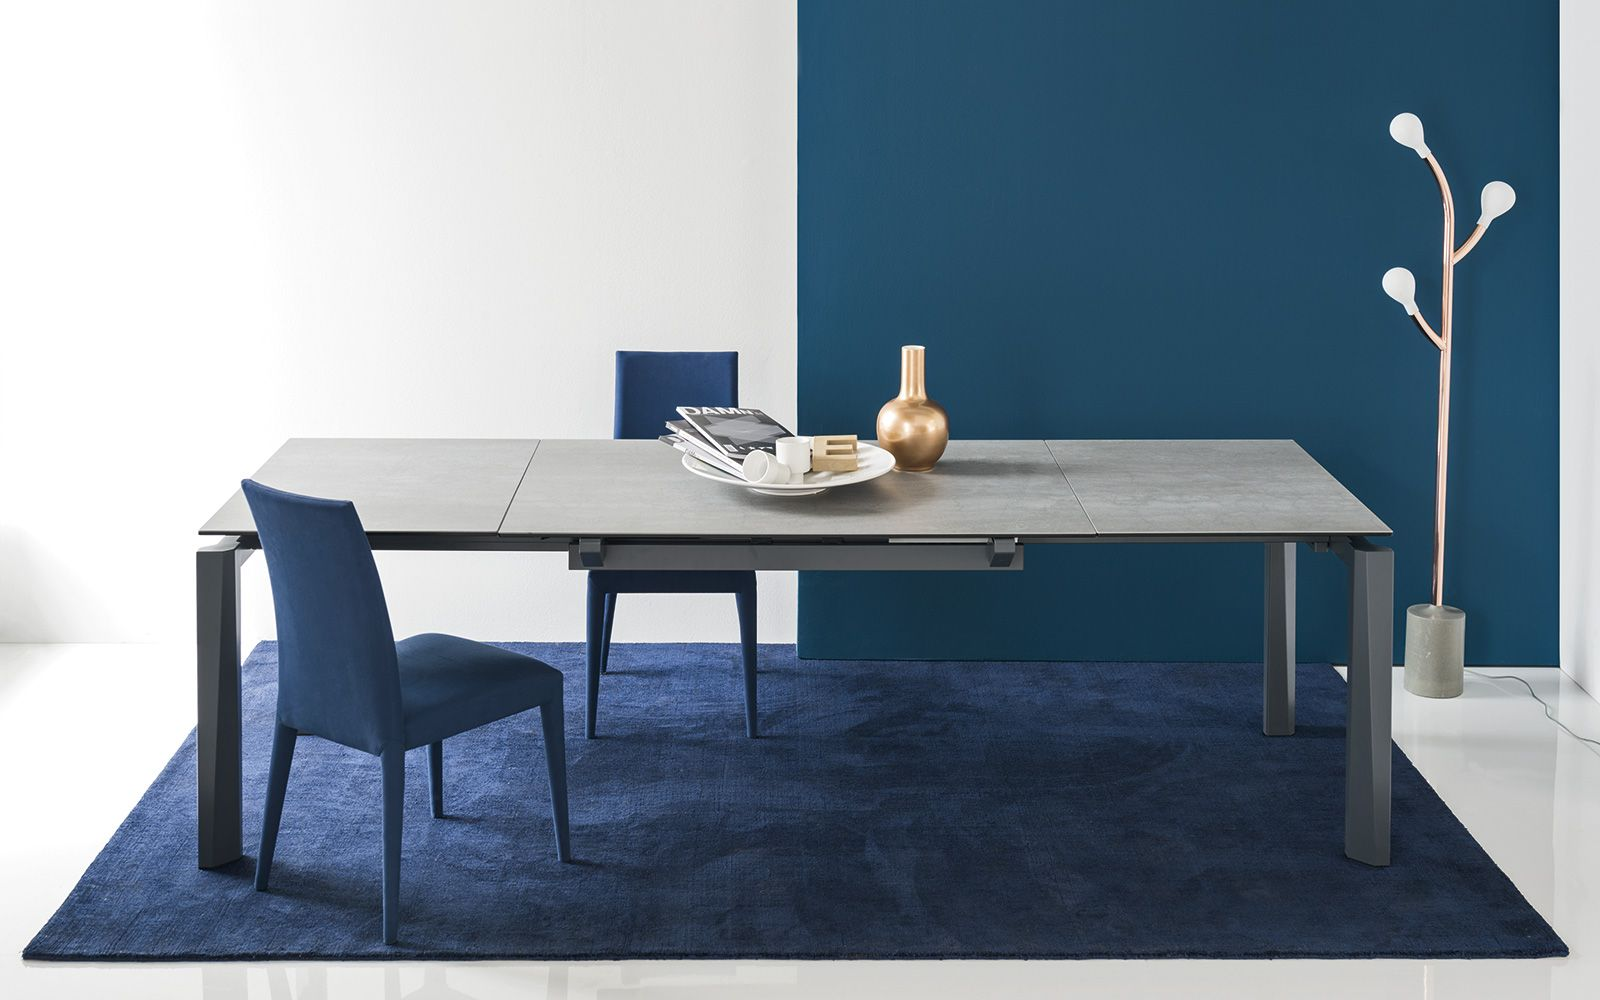 Tavoli Da Cucina Calligaris : Tavolo e sedie calligaris tavoli da pranzo pinterest modern